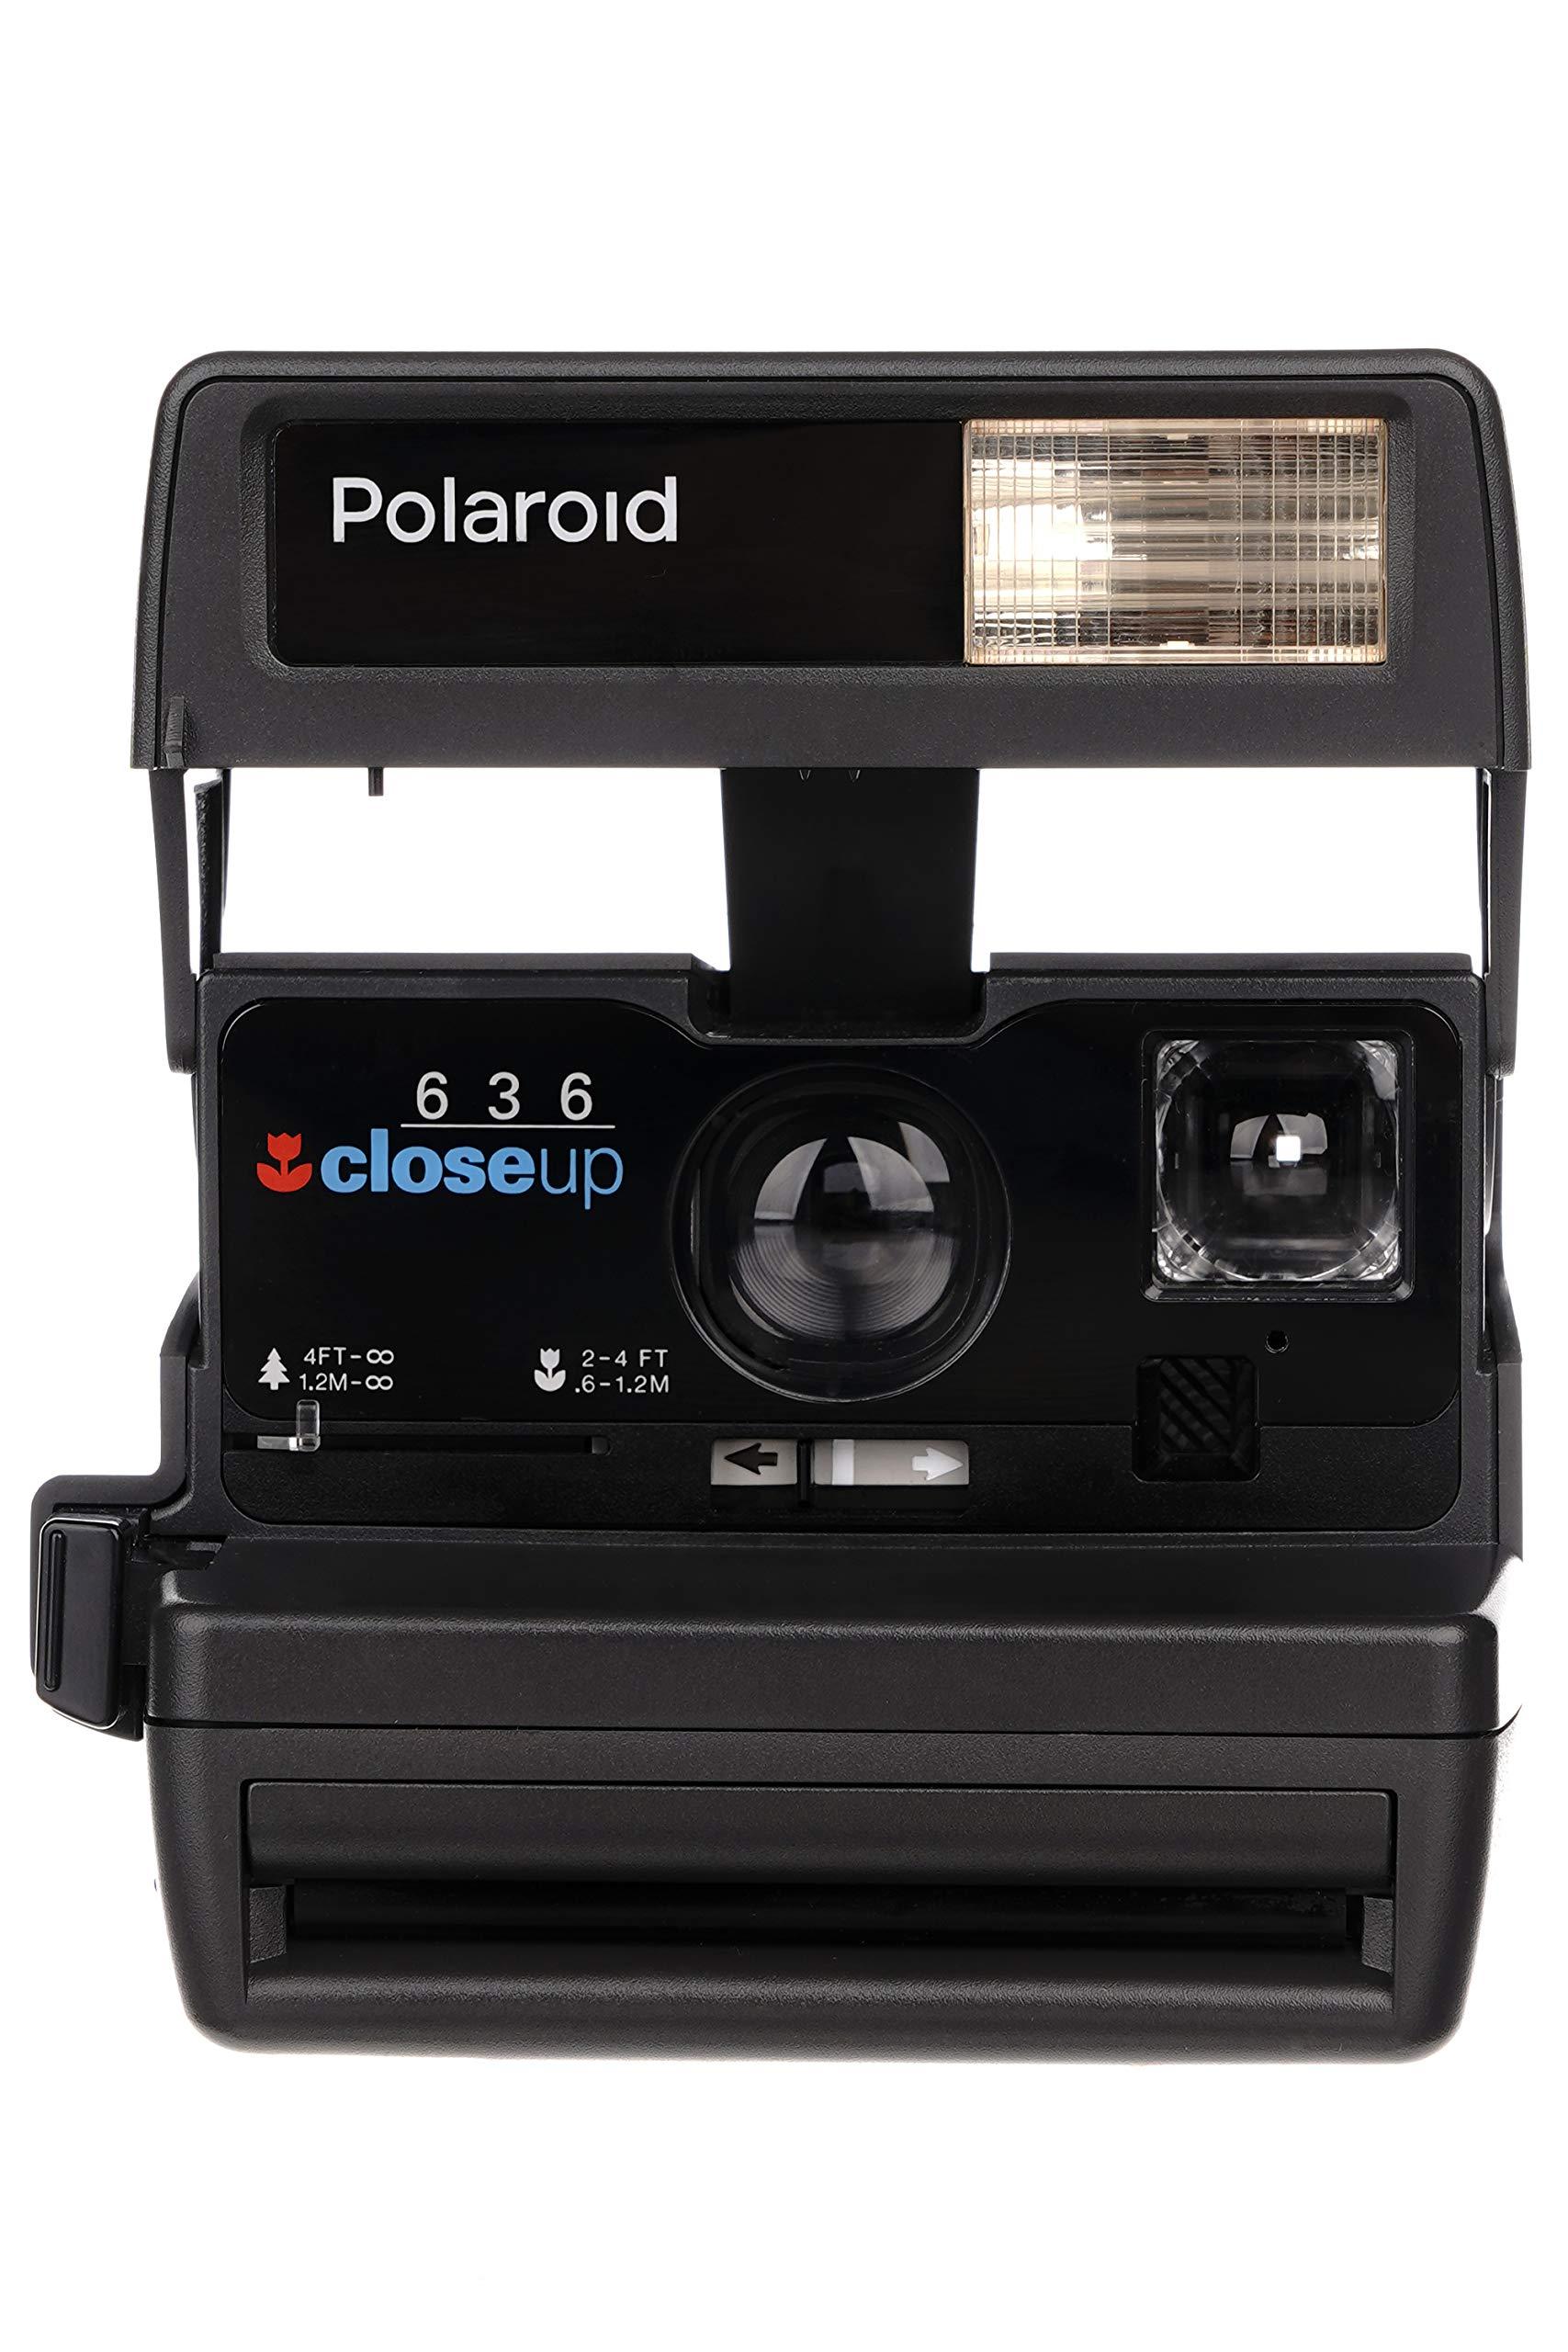 Polaroid 636 CL Compact Camera-Instant